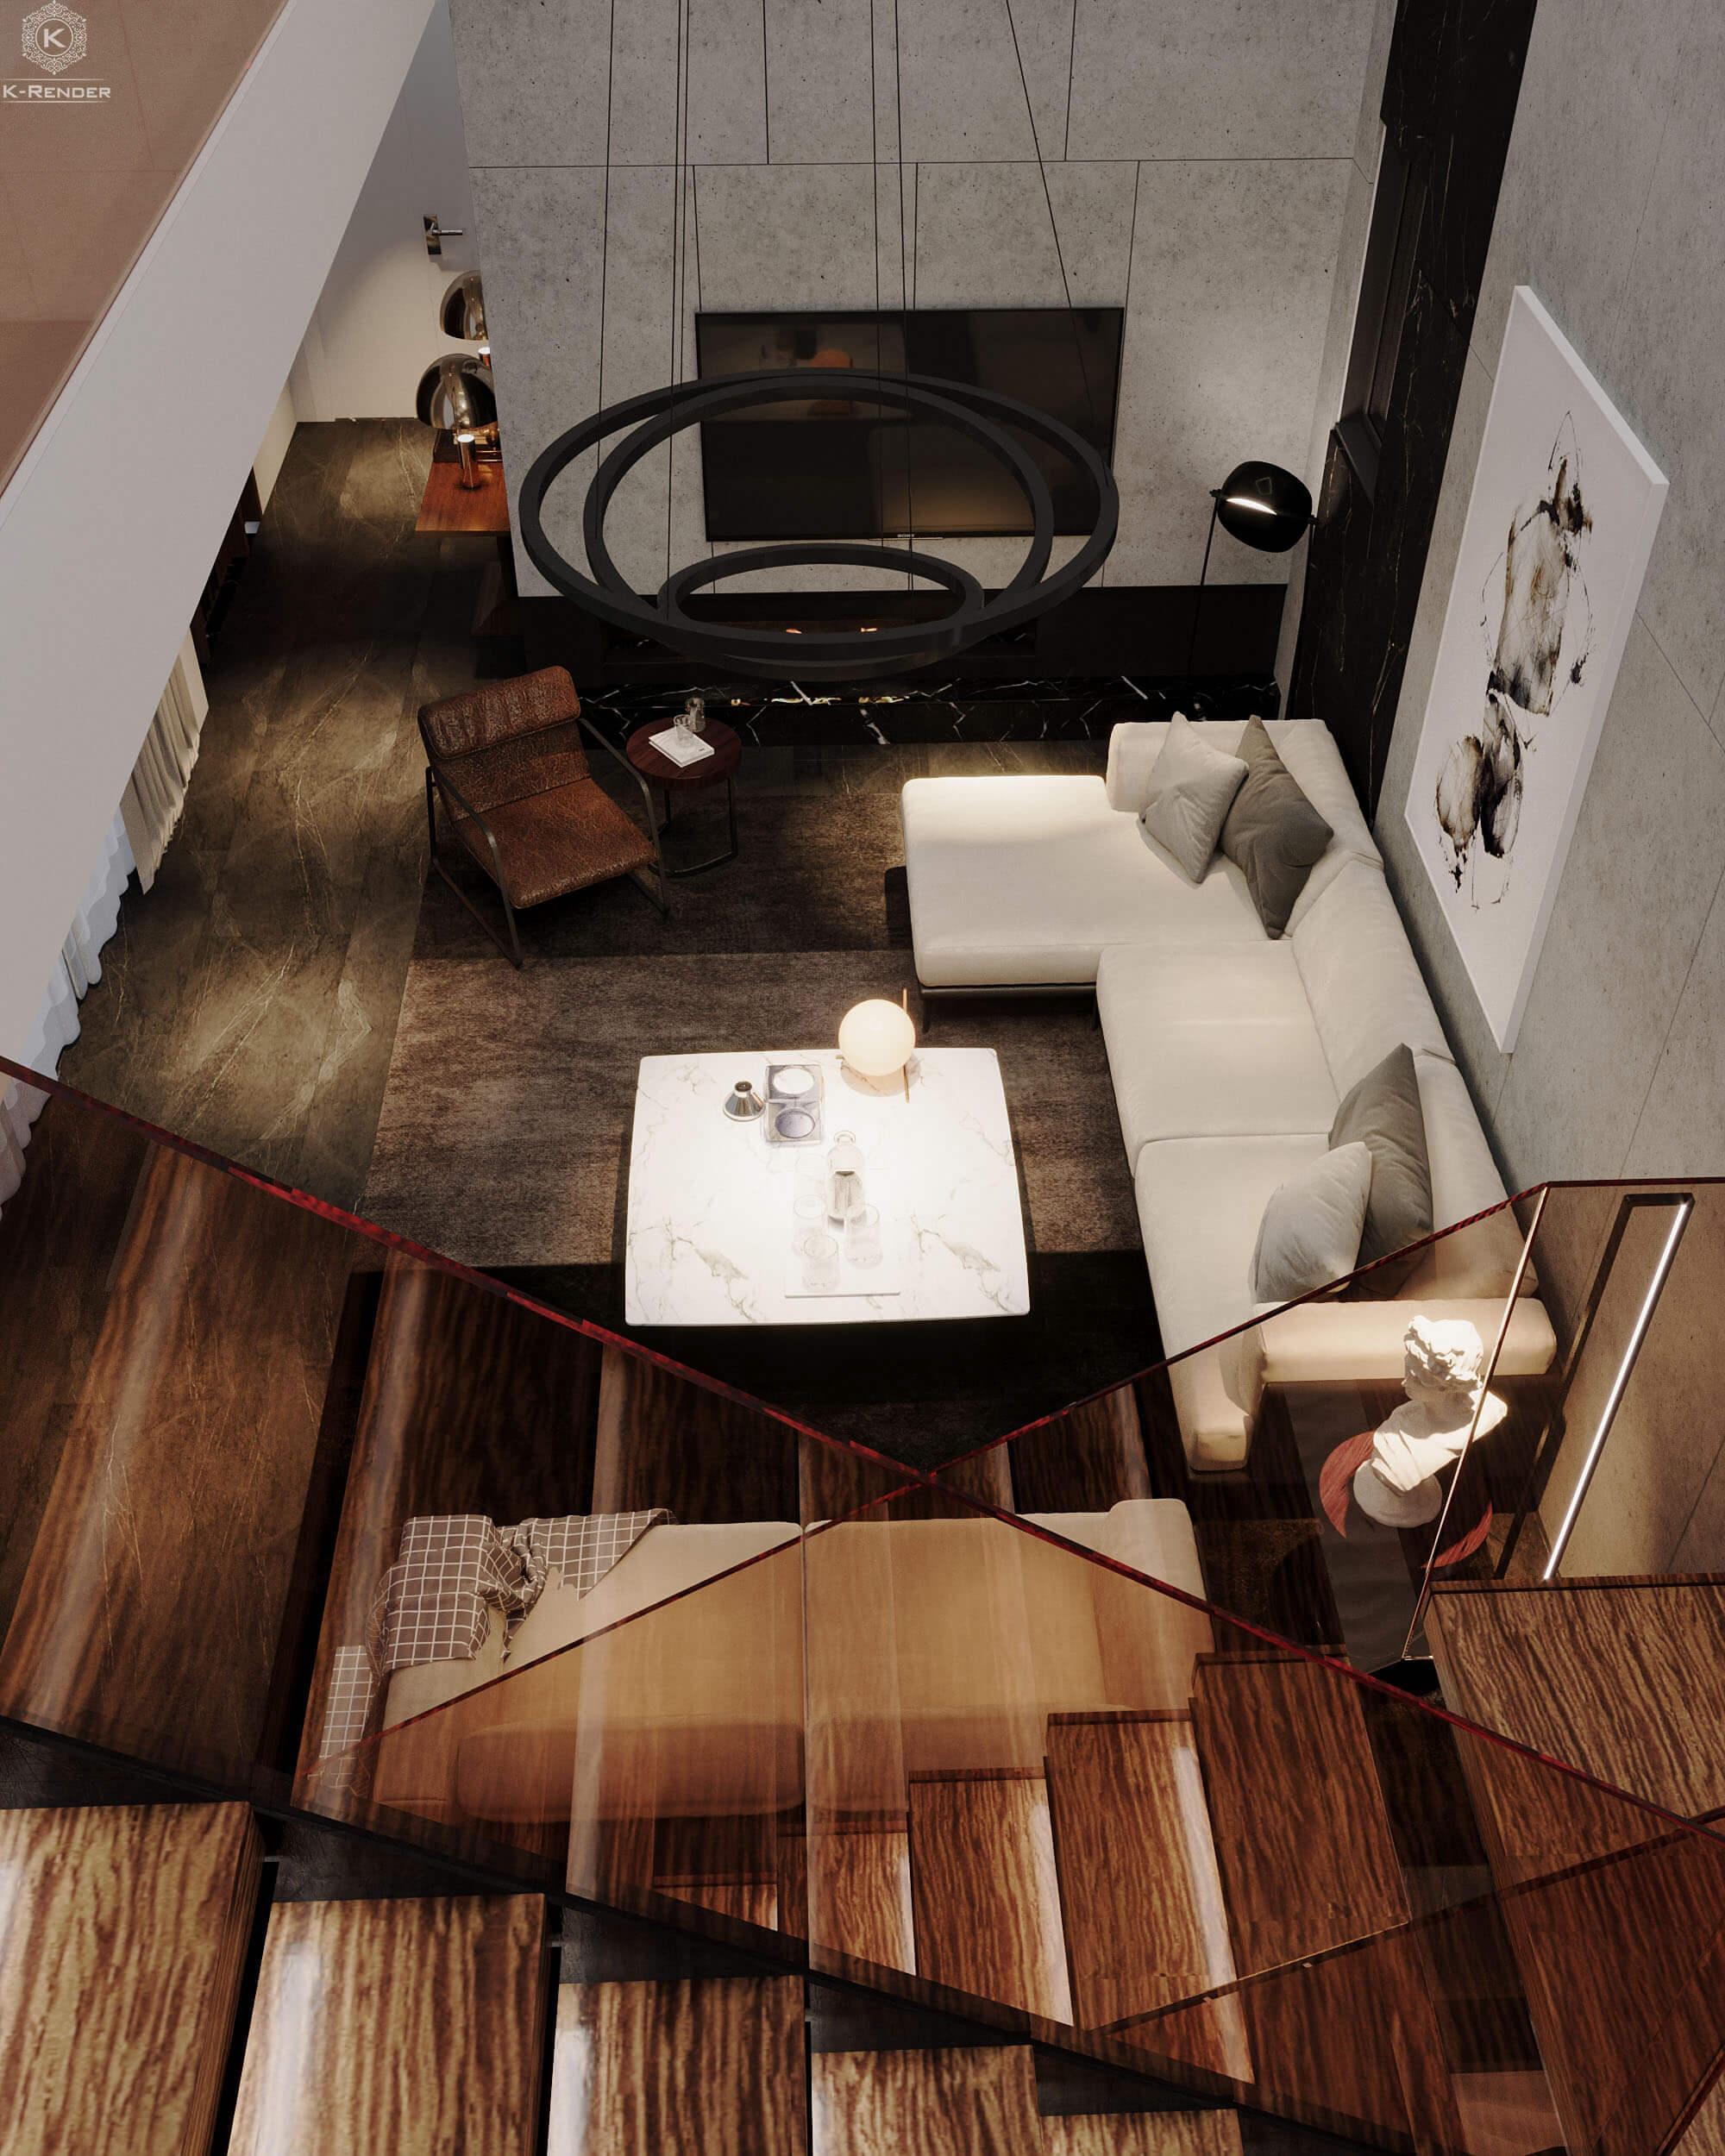 La-Veranda-project-by-k-render-studio-4